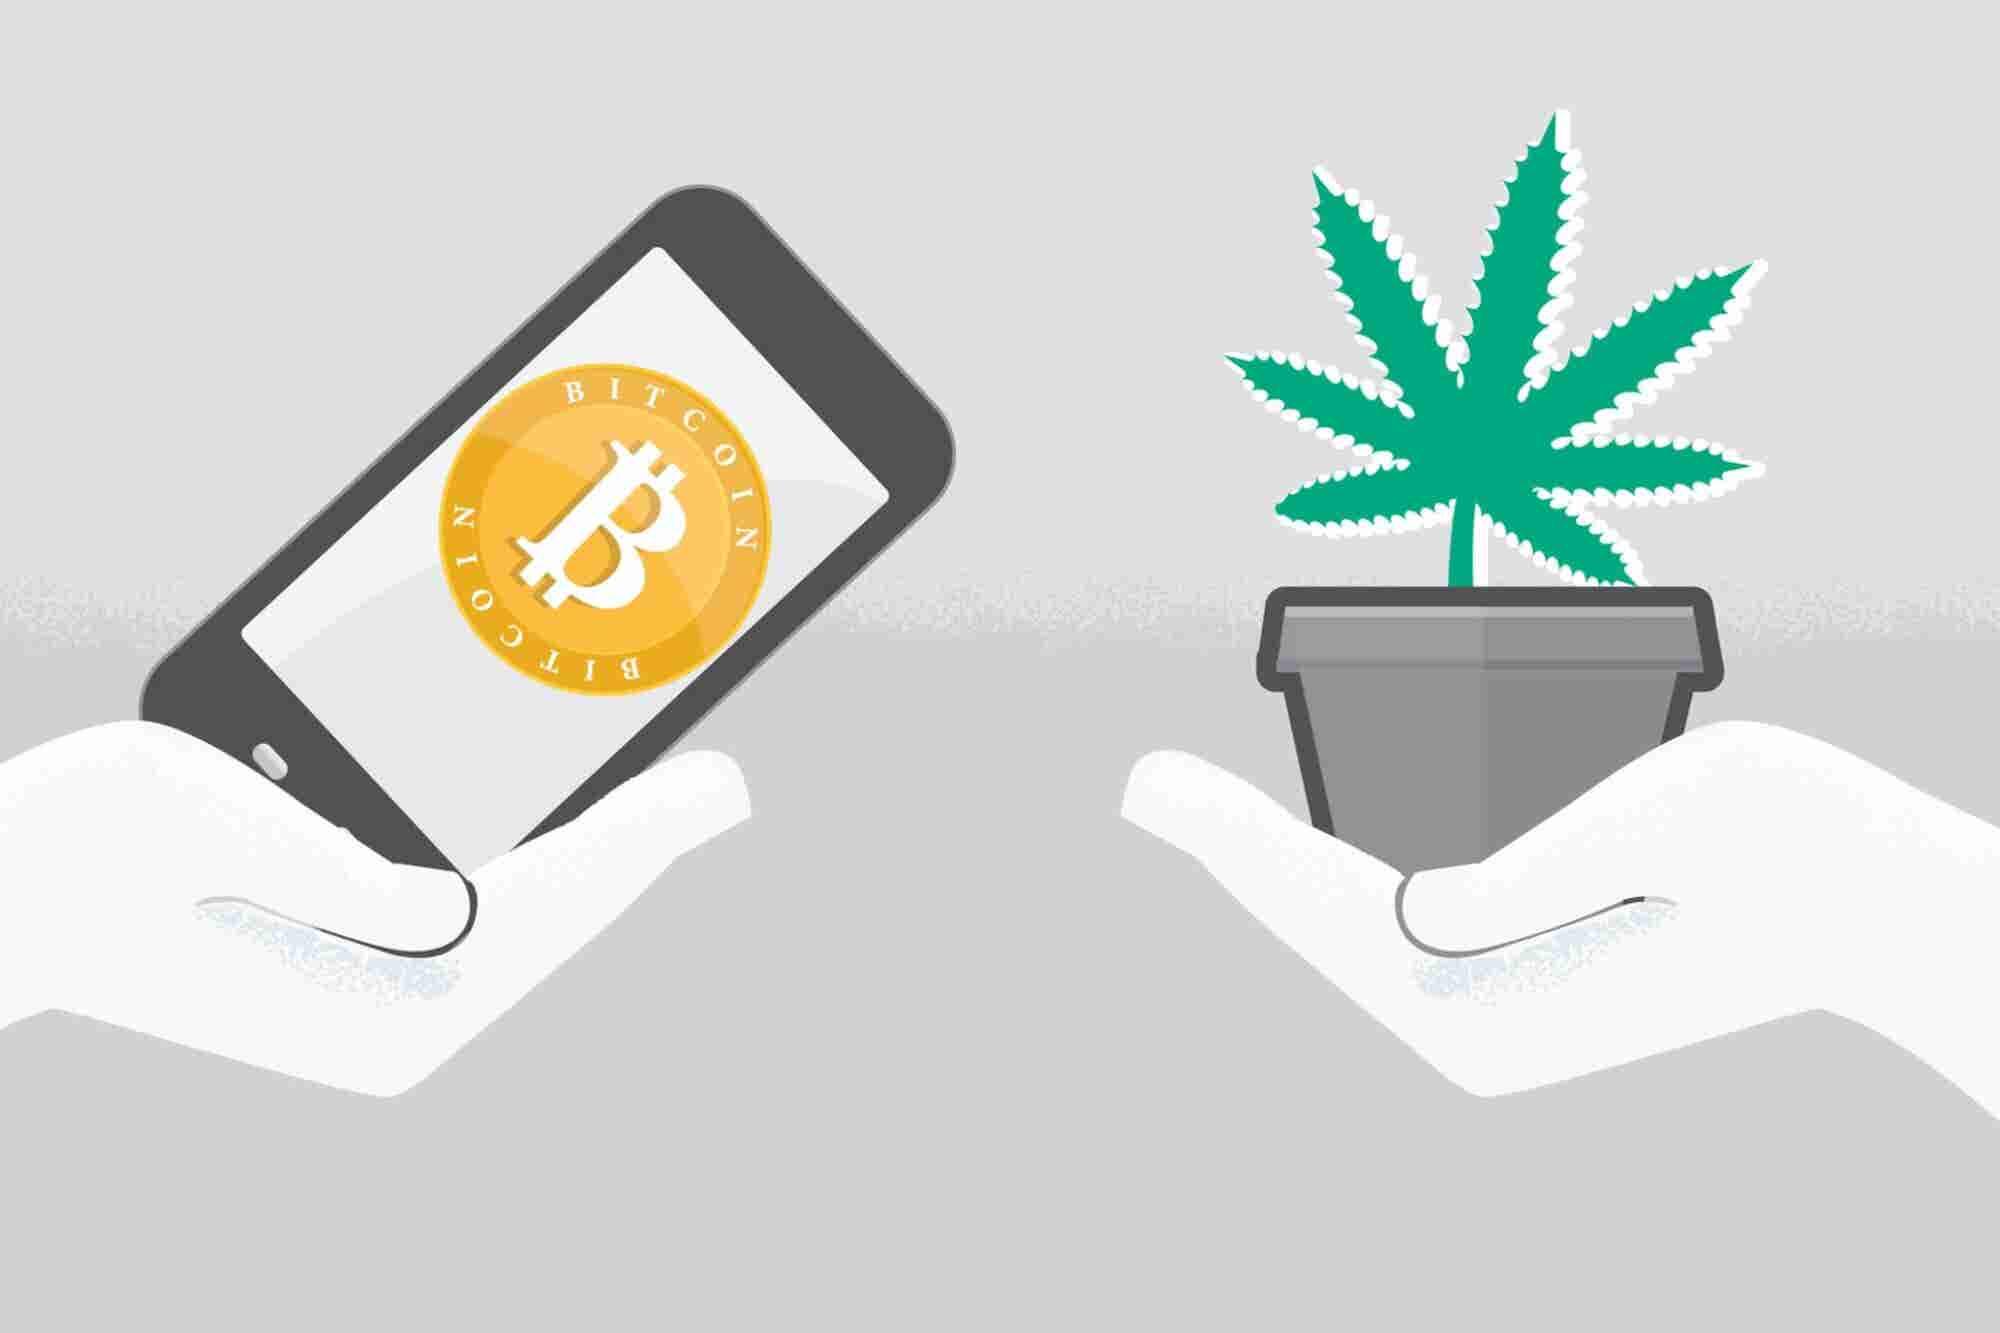 3 Ways Blockchain Could Help Solve the Cannabis Business's Biggest Roadblocks